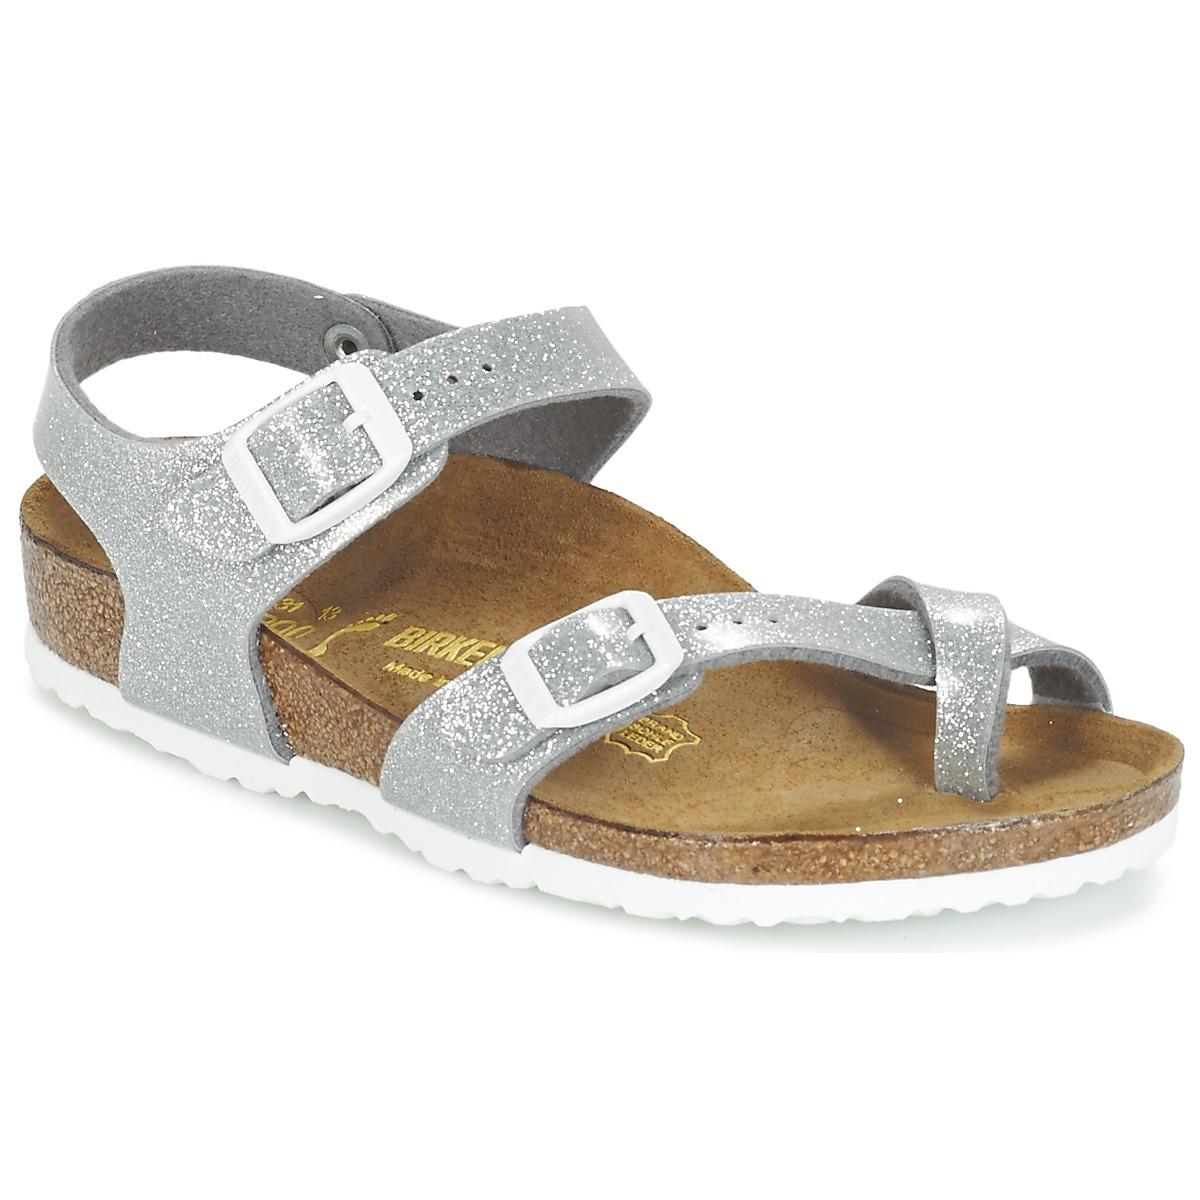 Sandale Birkenstock TAORMINA Argent